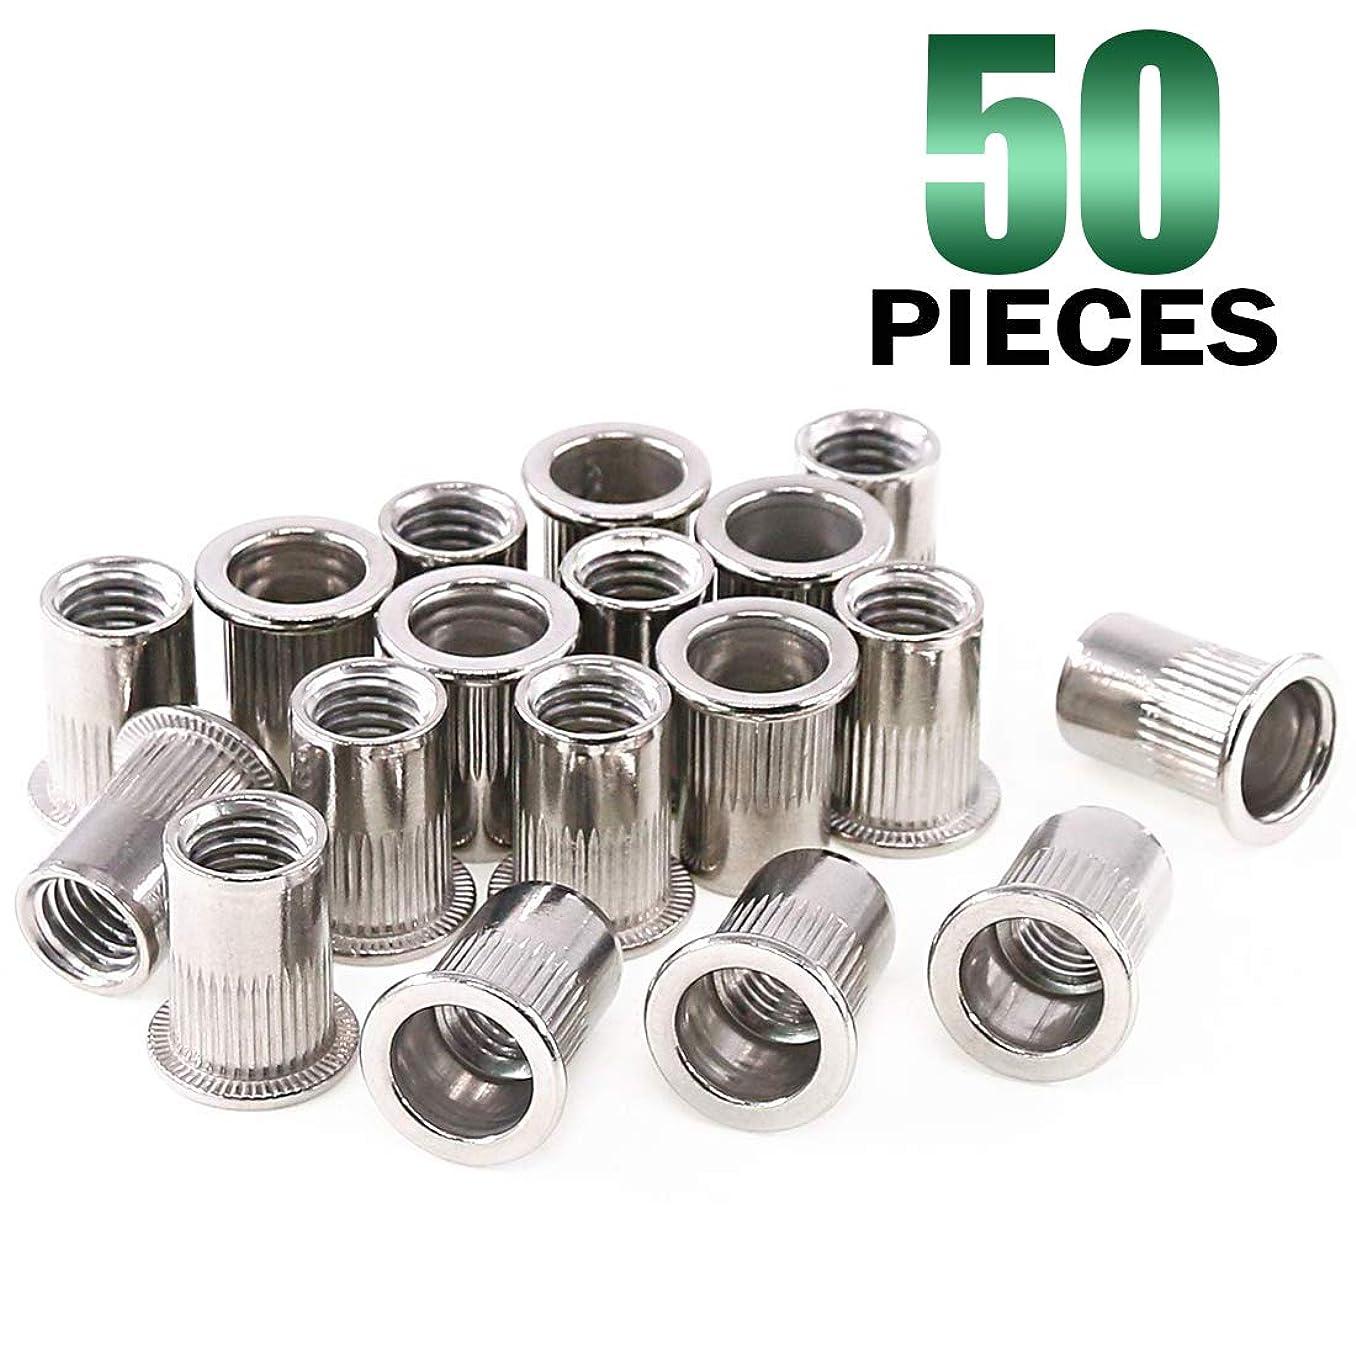 Keadic 50Pcs 304 Stainless Steel Metric Rivet Nut Flat Head Threaded Insert Nutsert Kit - M10